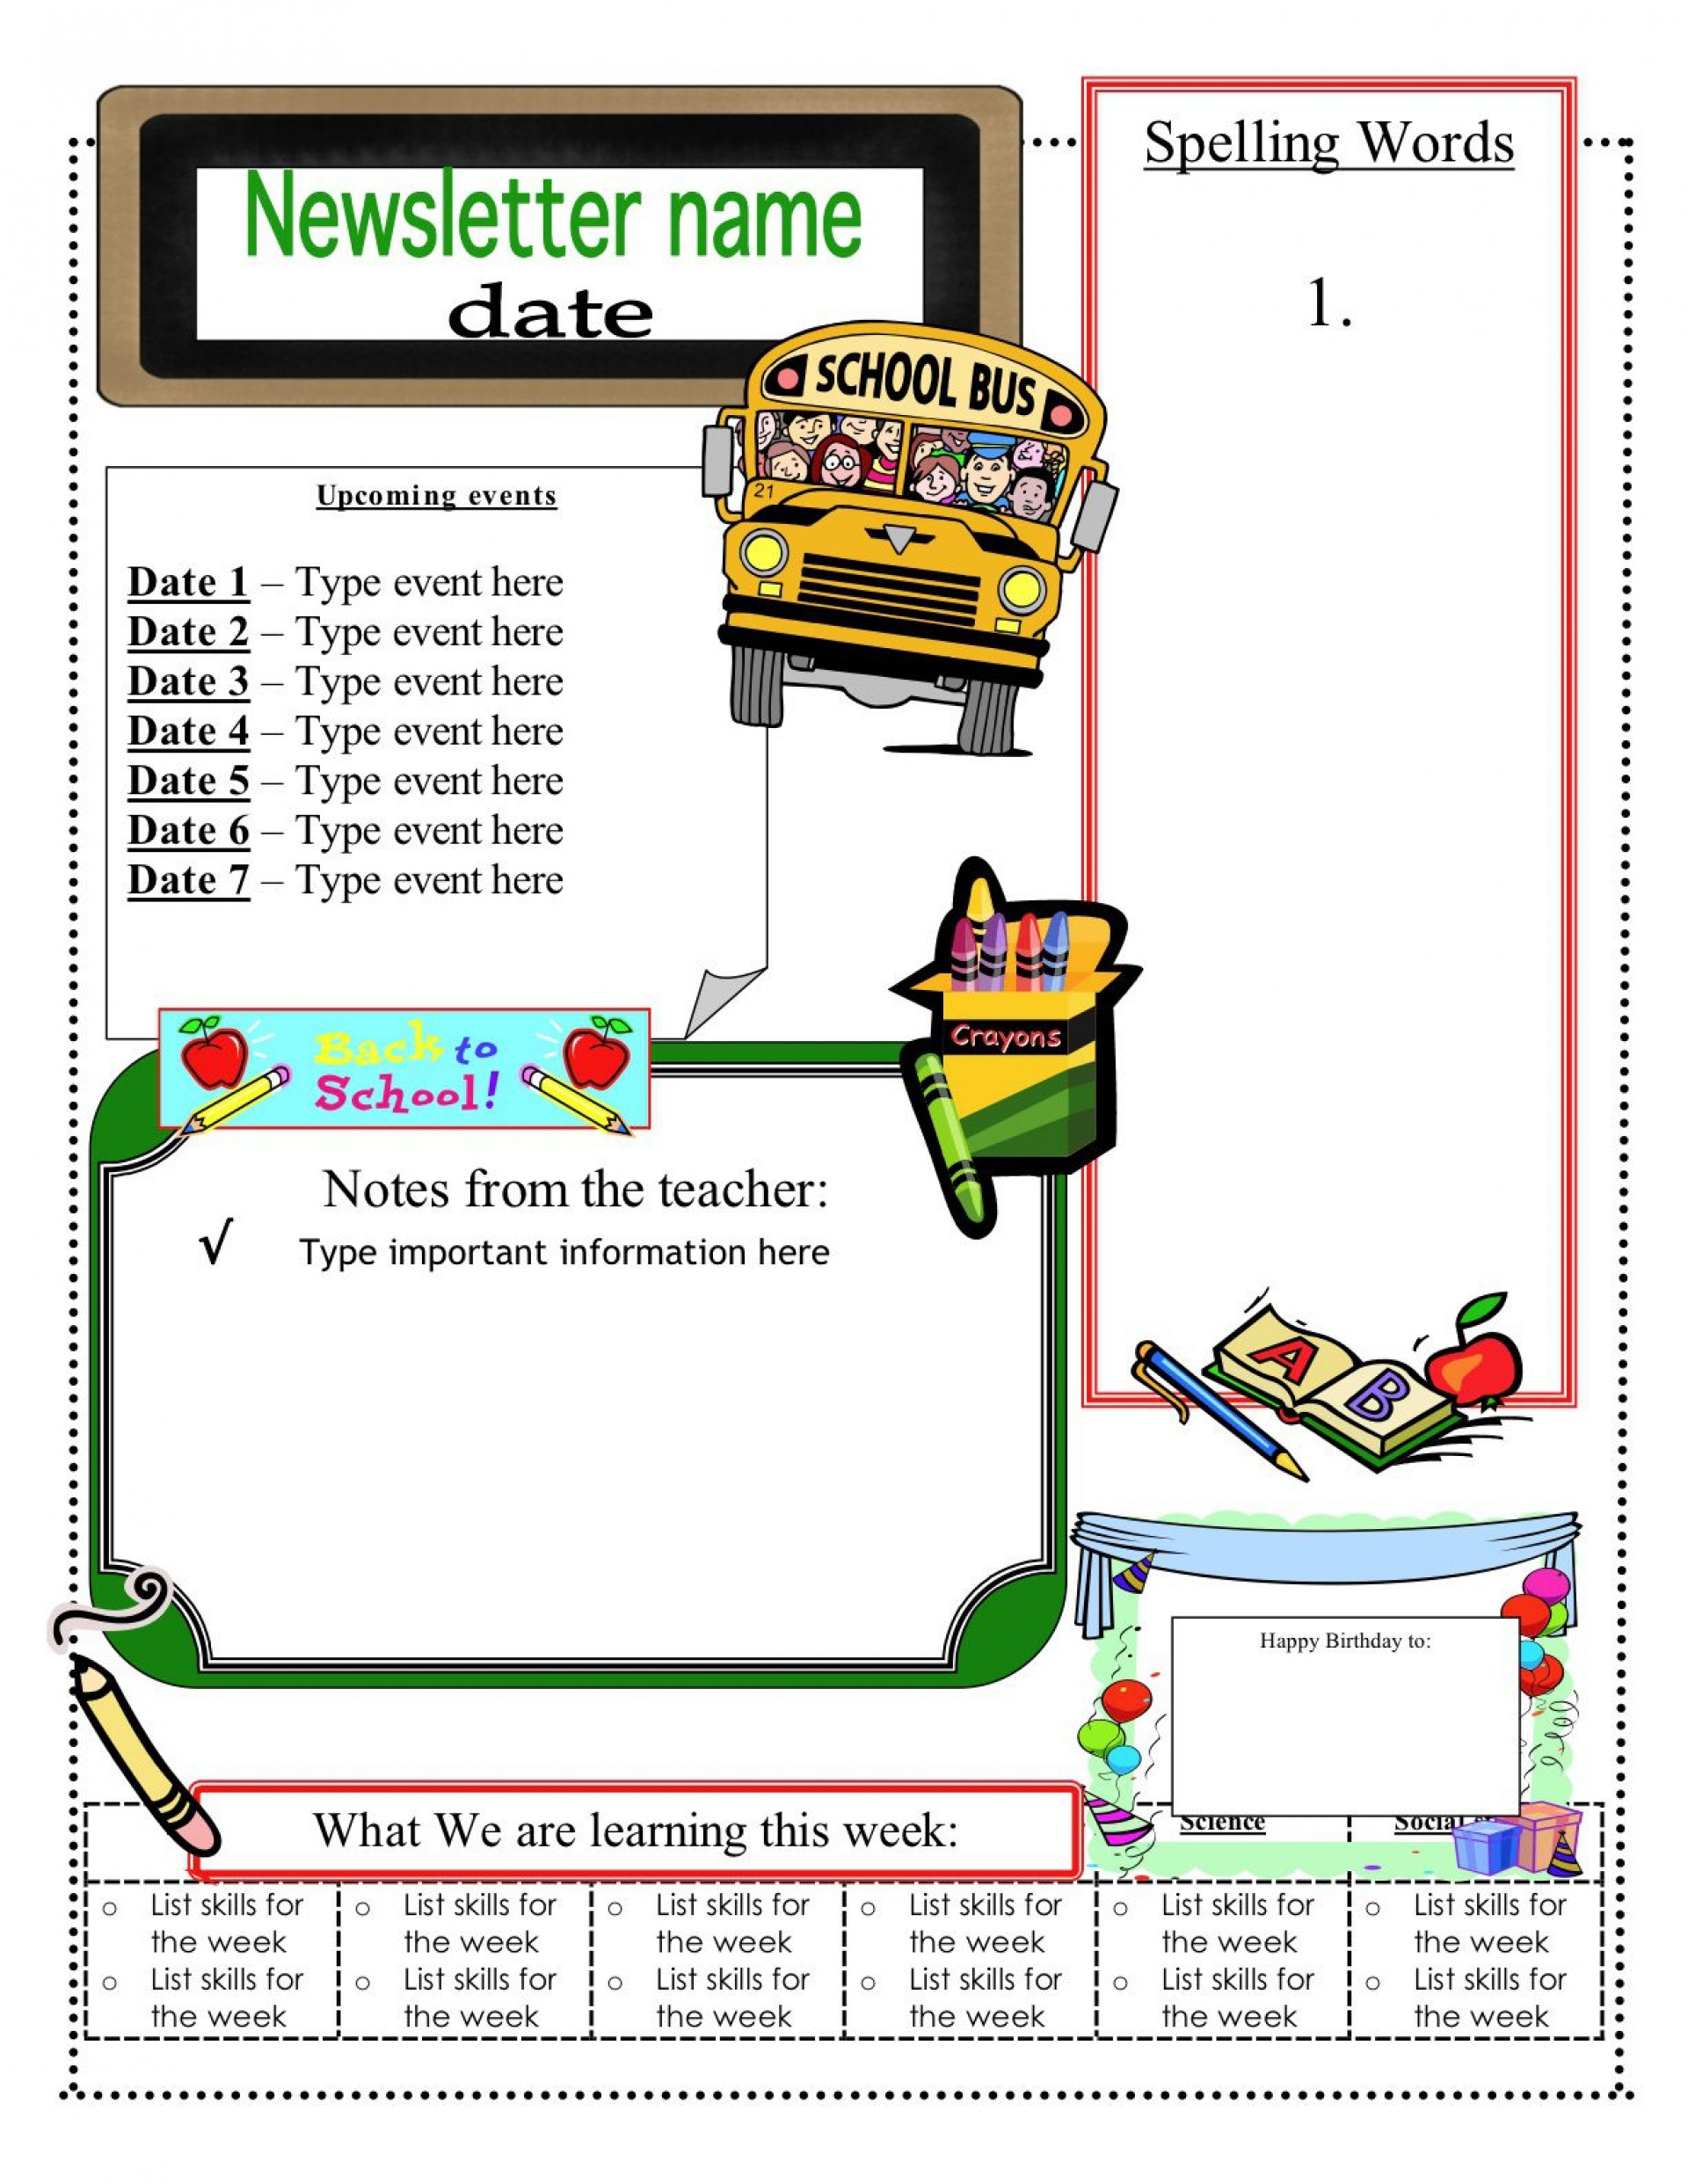 001 Best Newsletter Template For Teacher Sample  Teachers To Parent Free Printable Digital1920